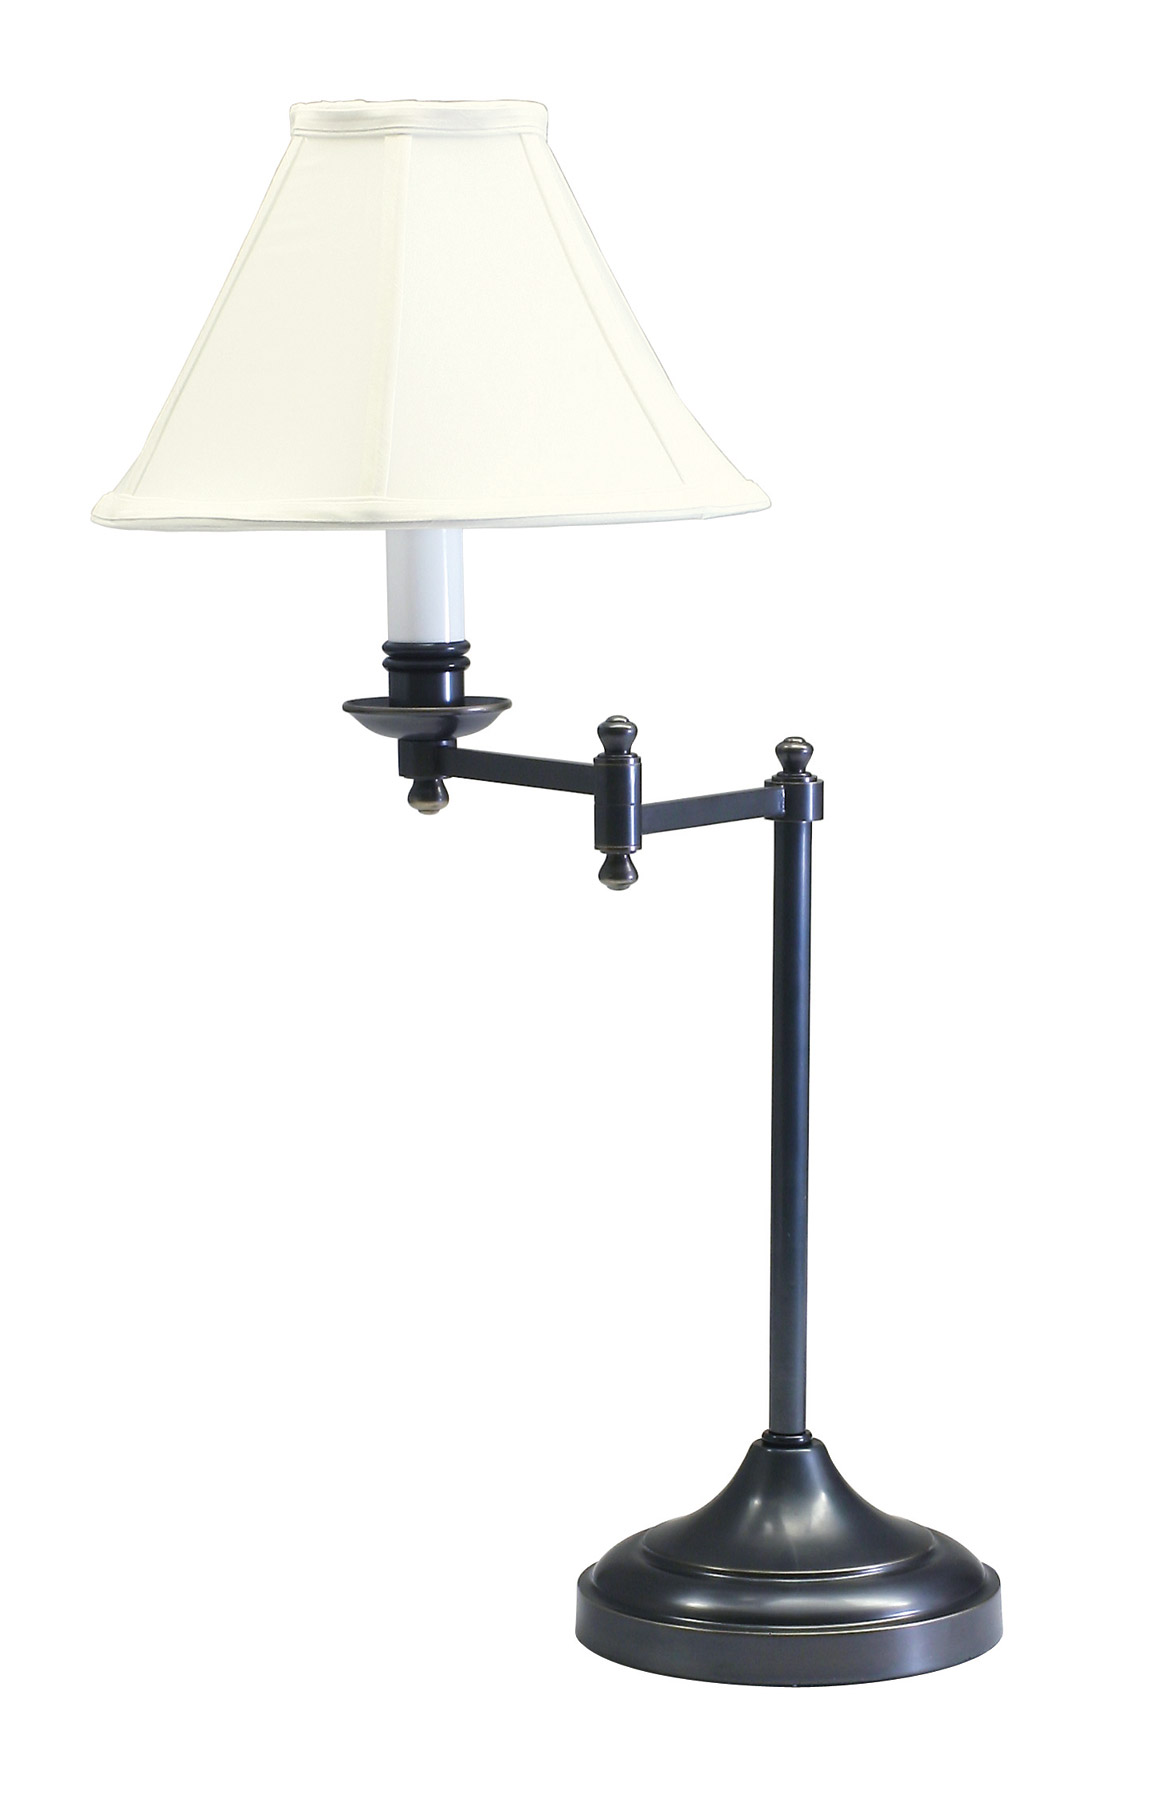 Swing arm floor lamp ikea 100 adjustable glass floor lamp for Arched floor lamp ikea